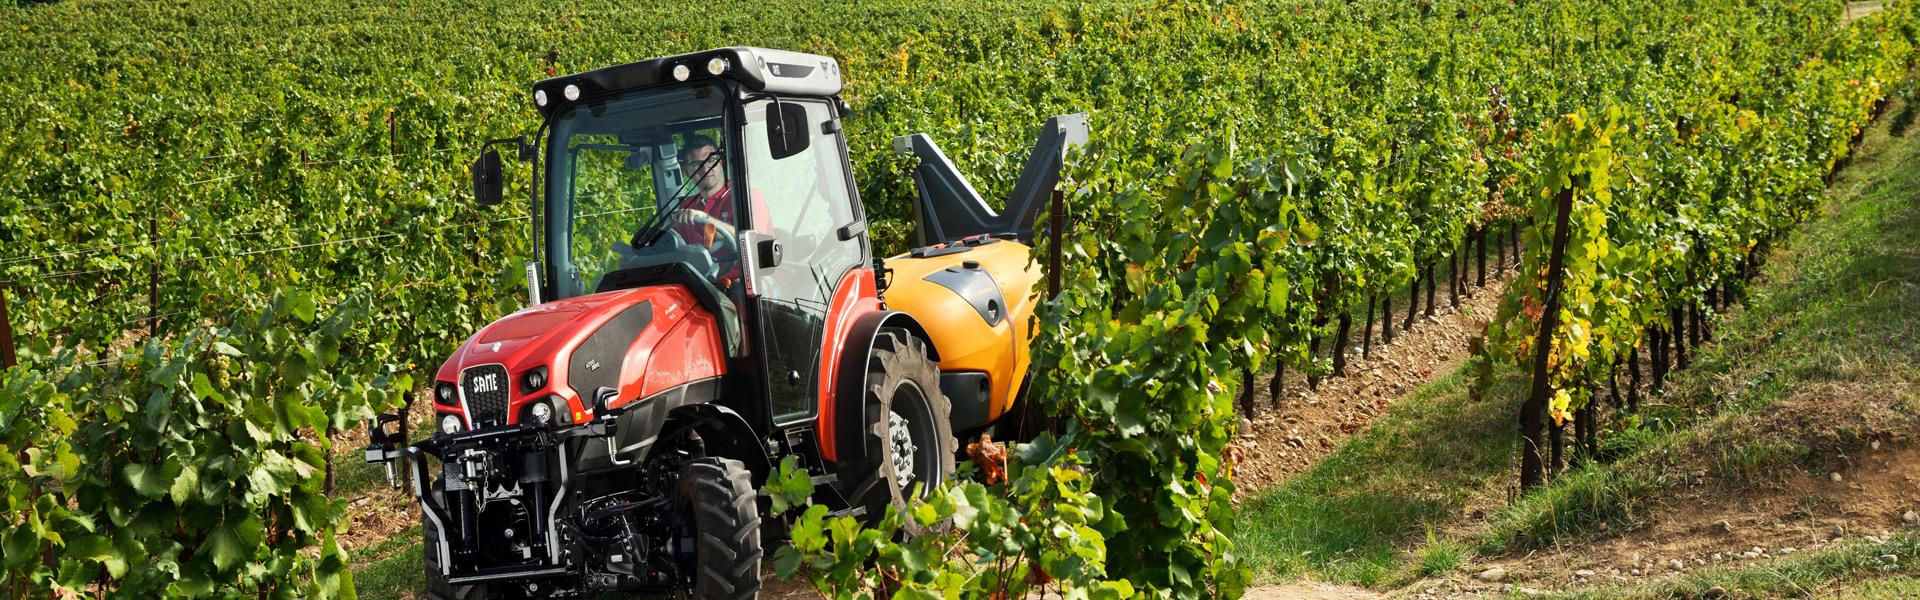 header-macchina-agricola-frutteto